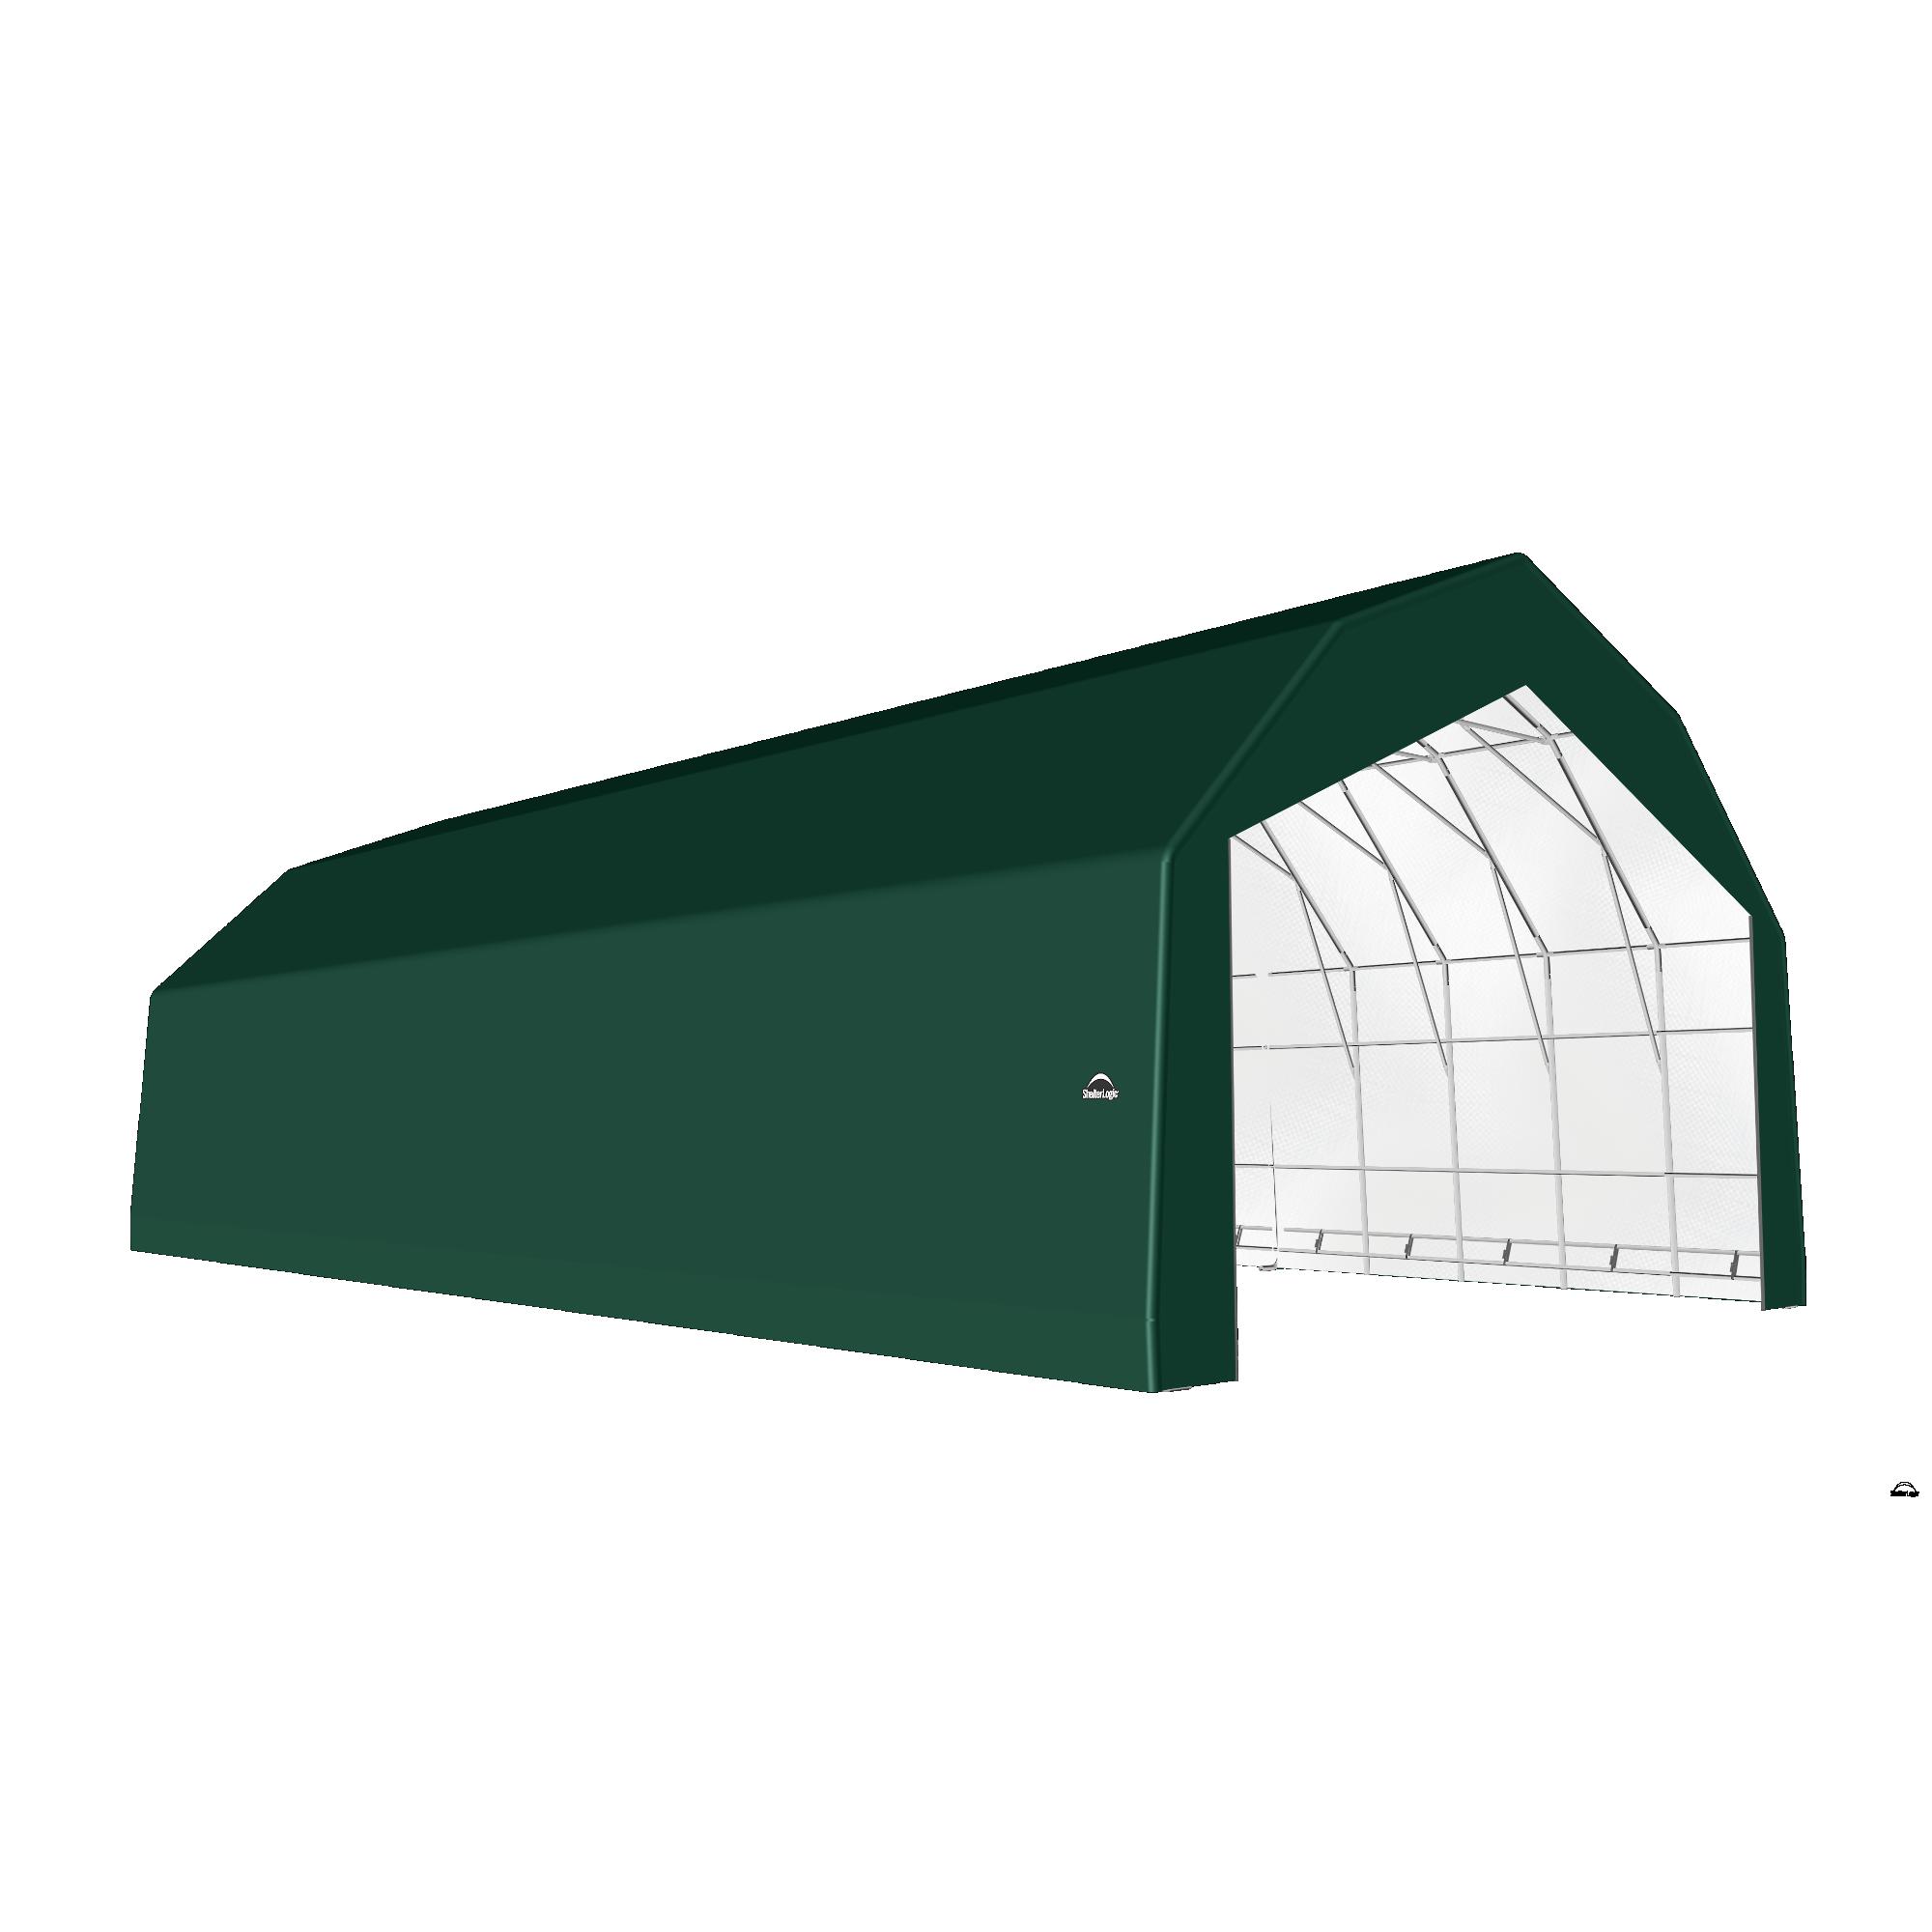 SP Barn 30X56X21 Green 14 oz PE Shelter